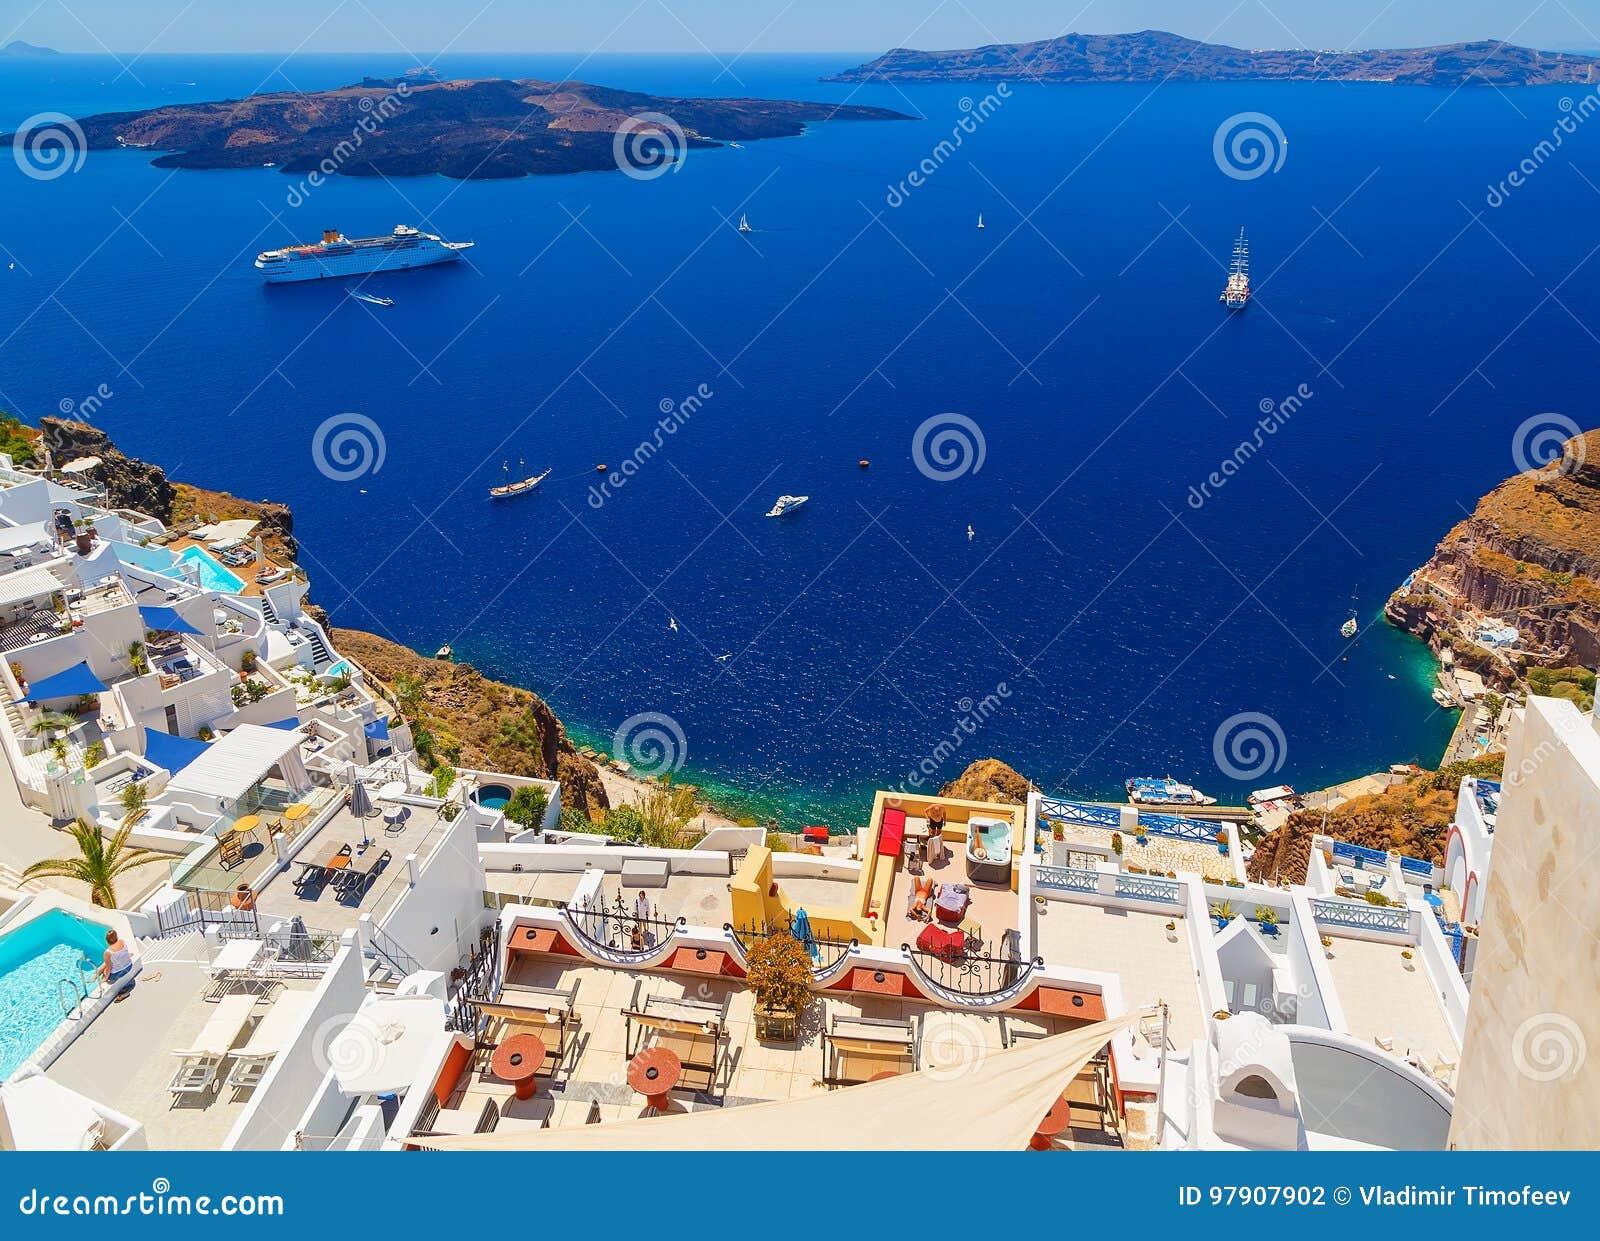 Caldera vulcânico de Santorini como visto de Fira, capital de Santorini, Grécia Hotéis com turistas vacationing